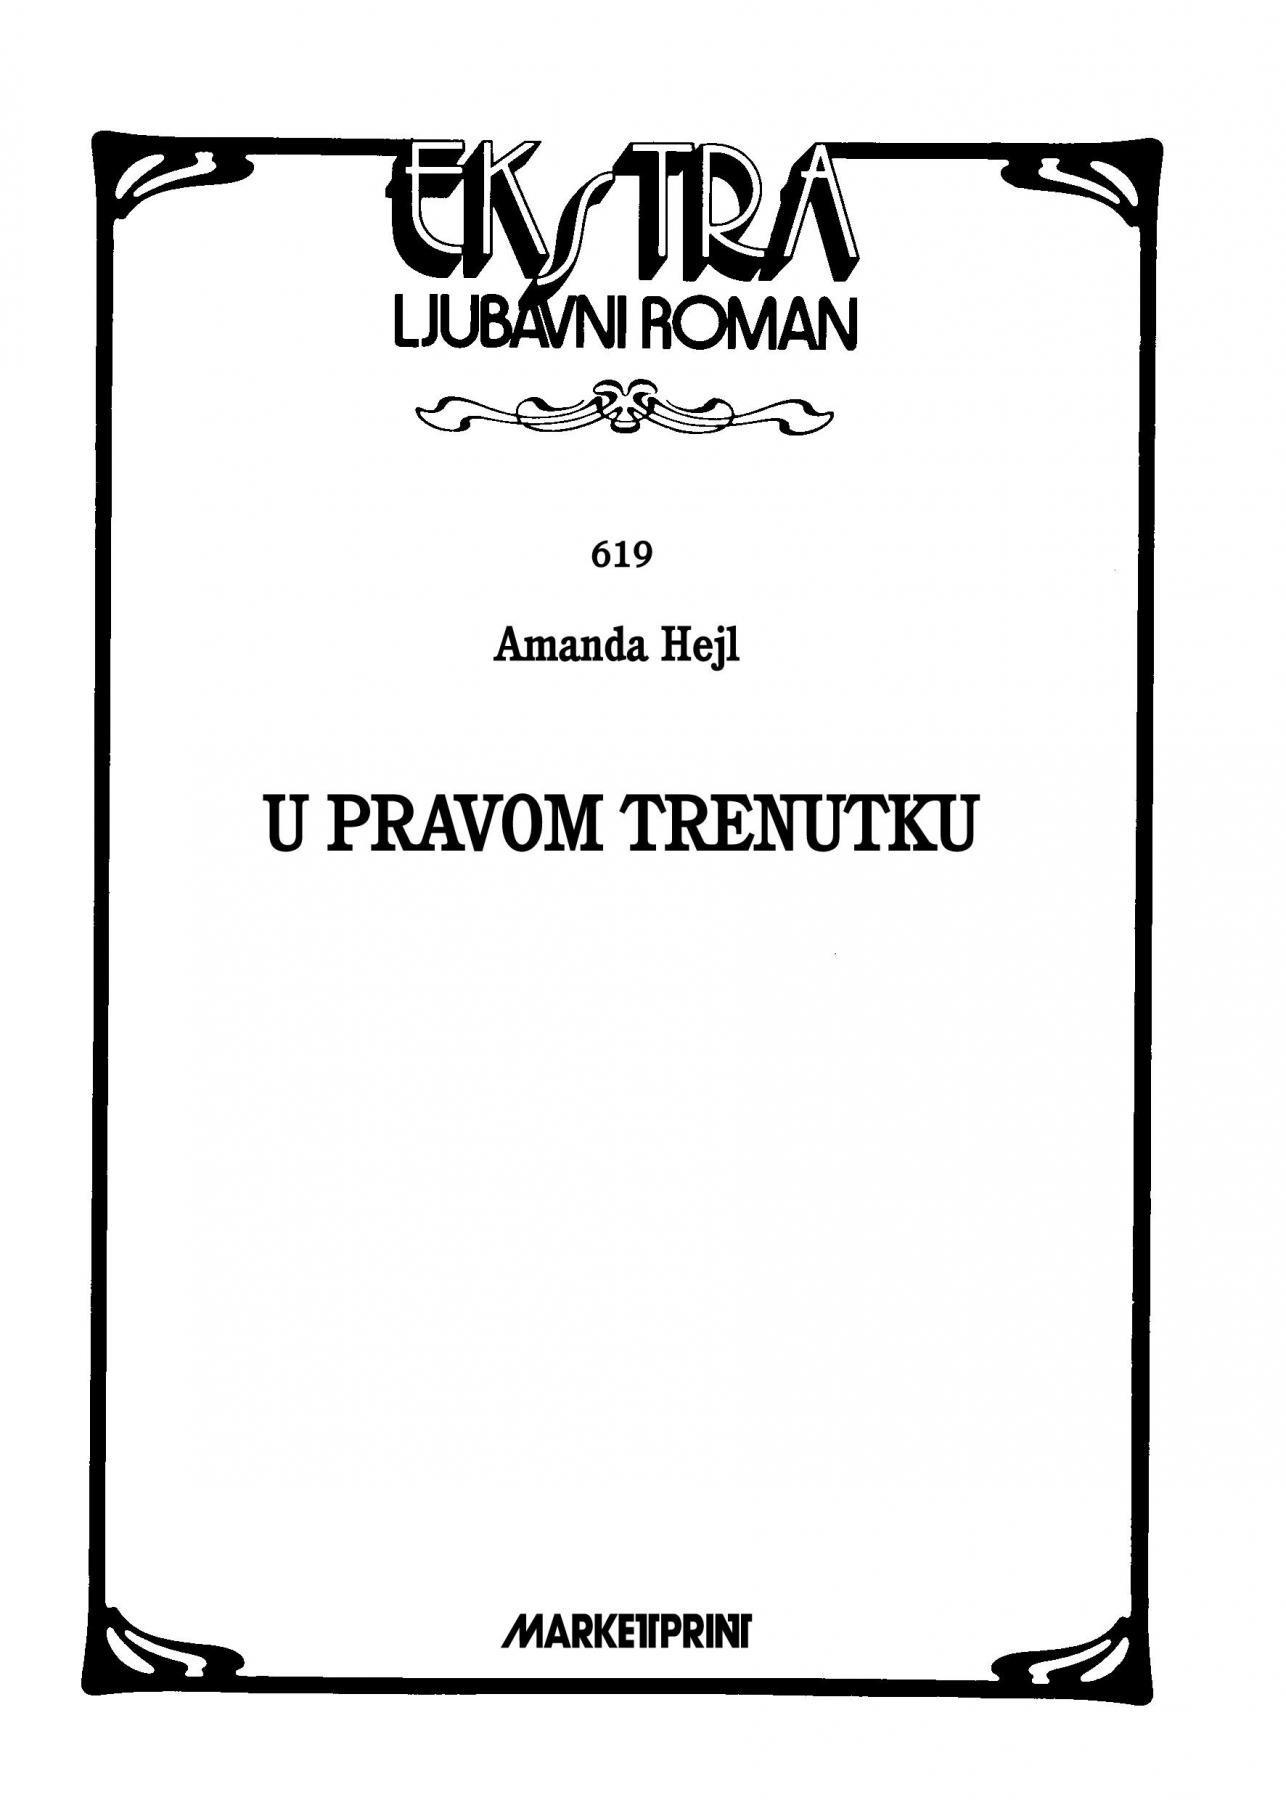 Romani novinarnica vikend ljubavni Astro Tarot